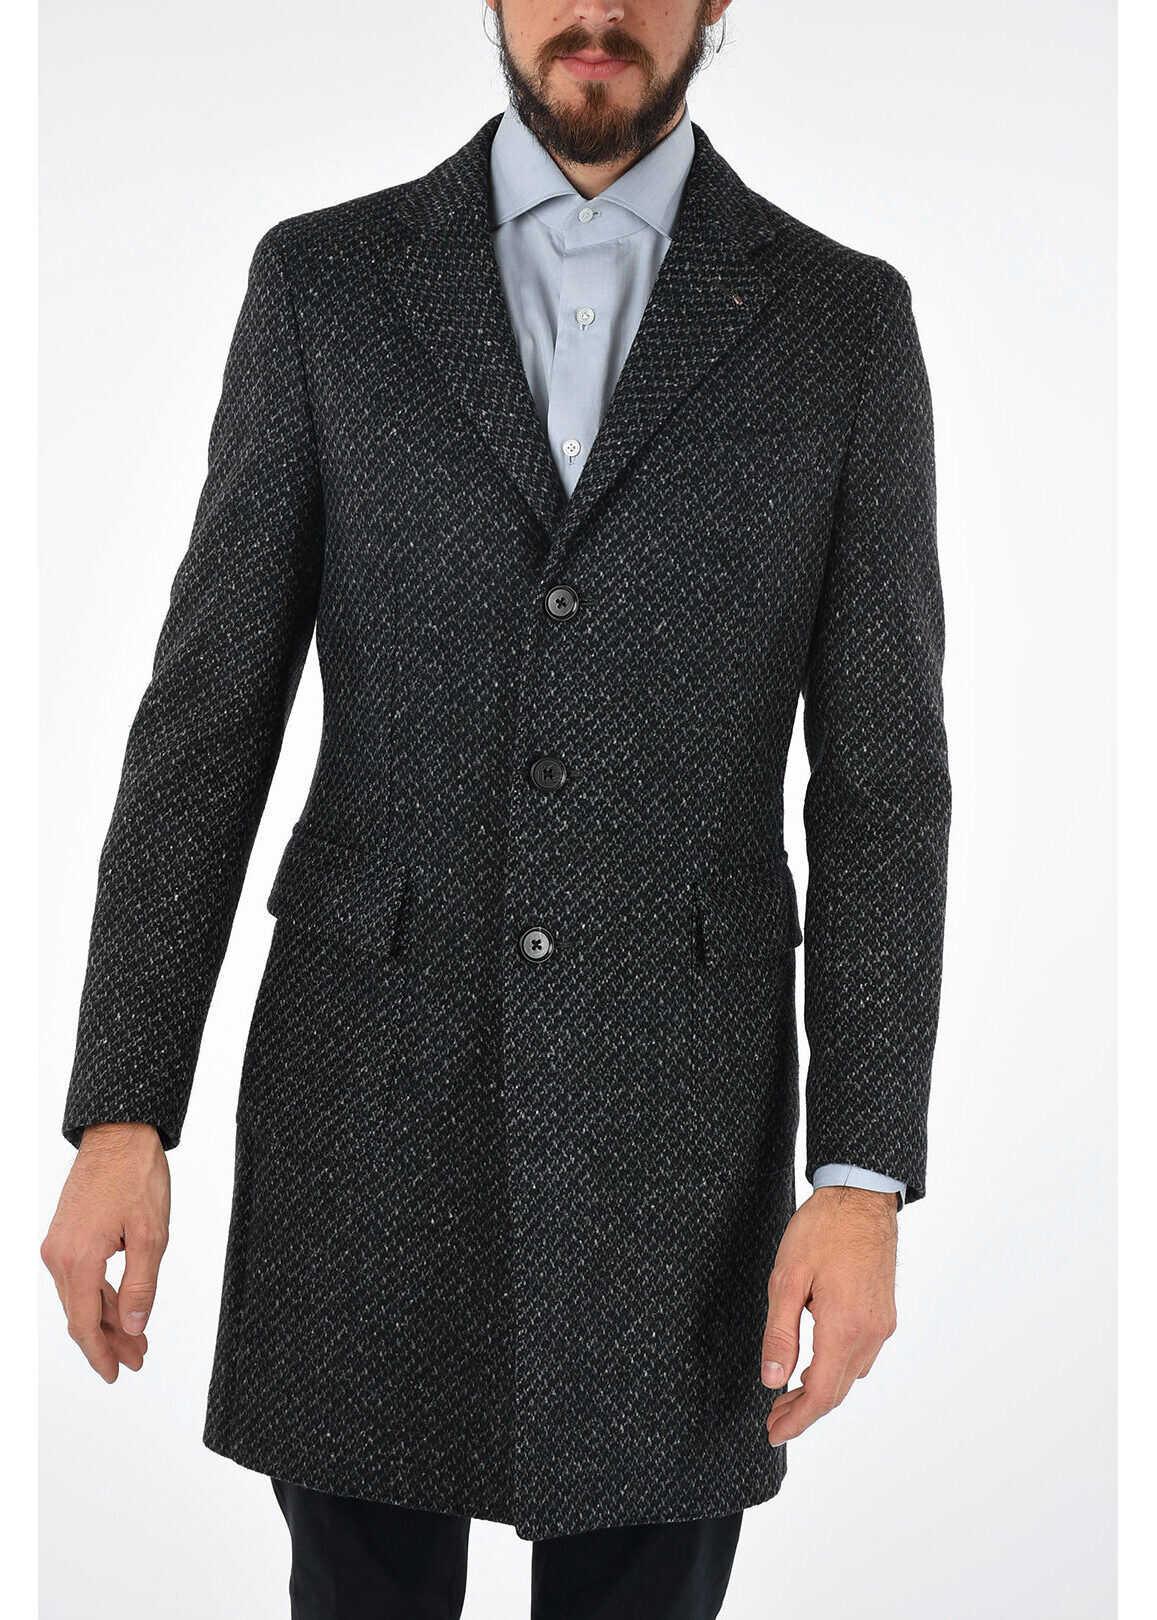 CORNELIANI 8R DROP Silk Blended Single Breasted 3 Button Coat N/A